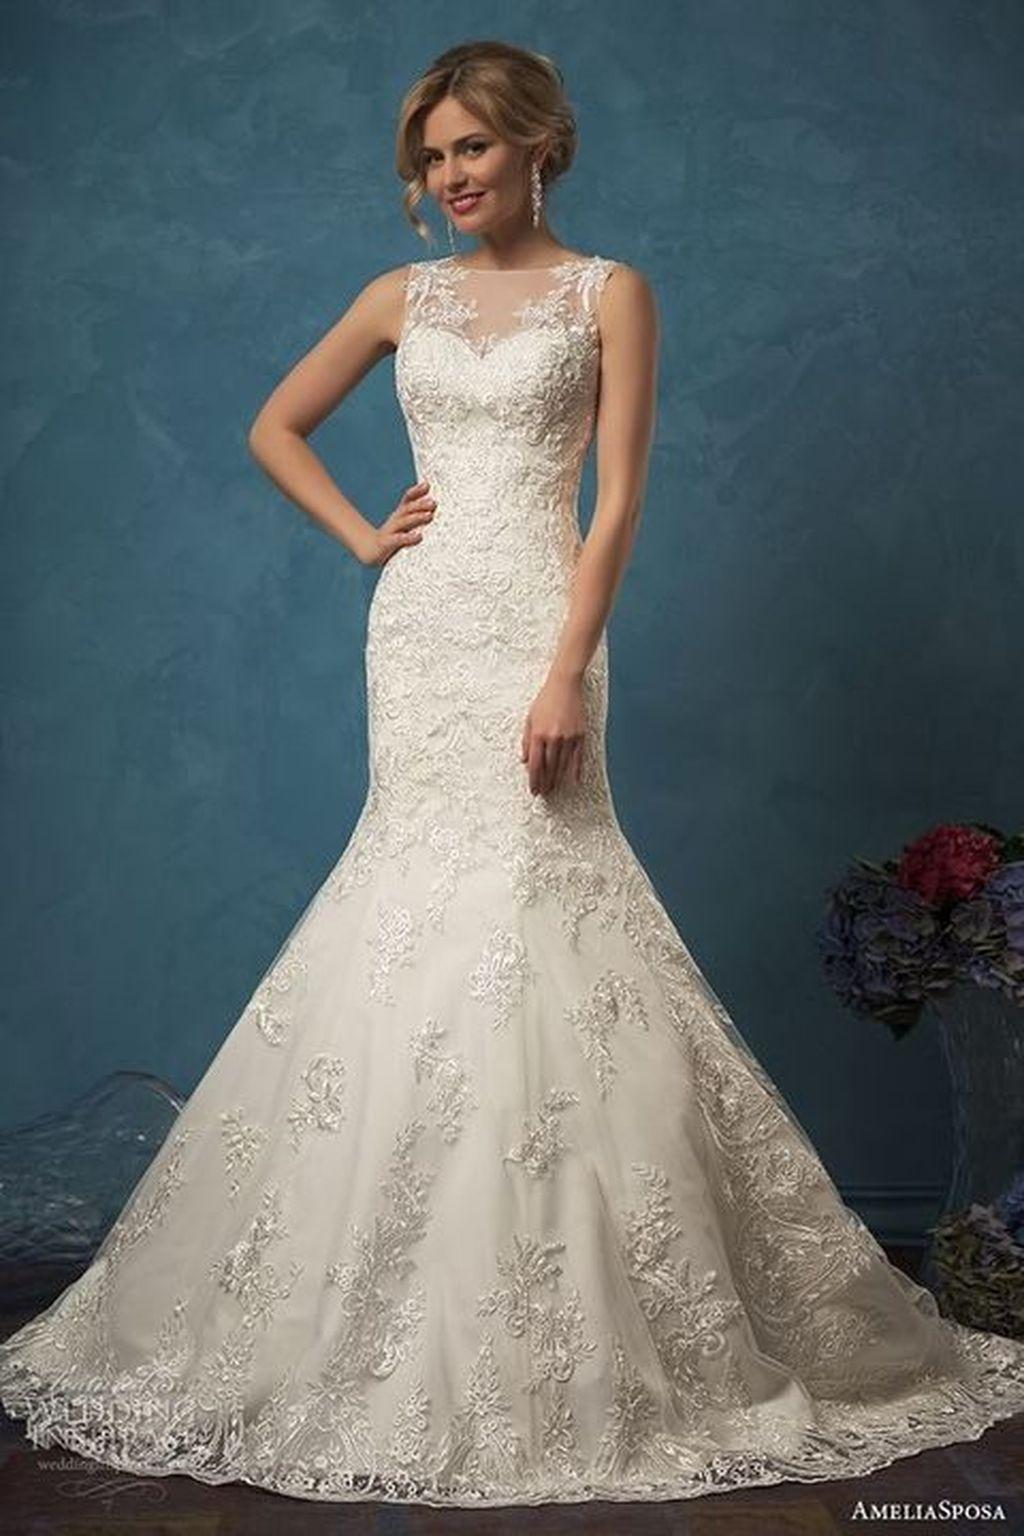 beautiful non traditional wedding dress ideas every women will